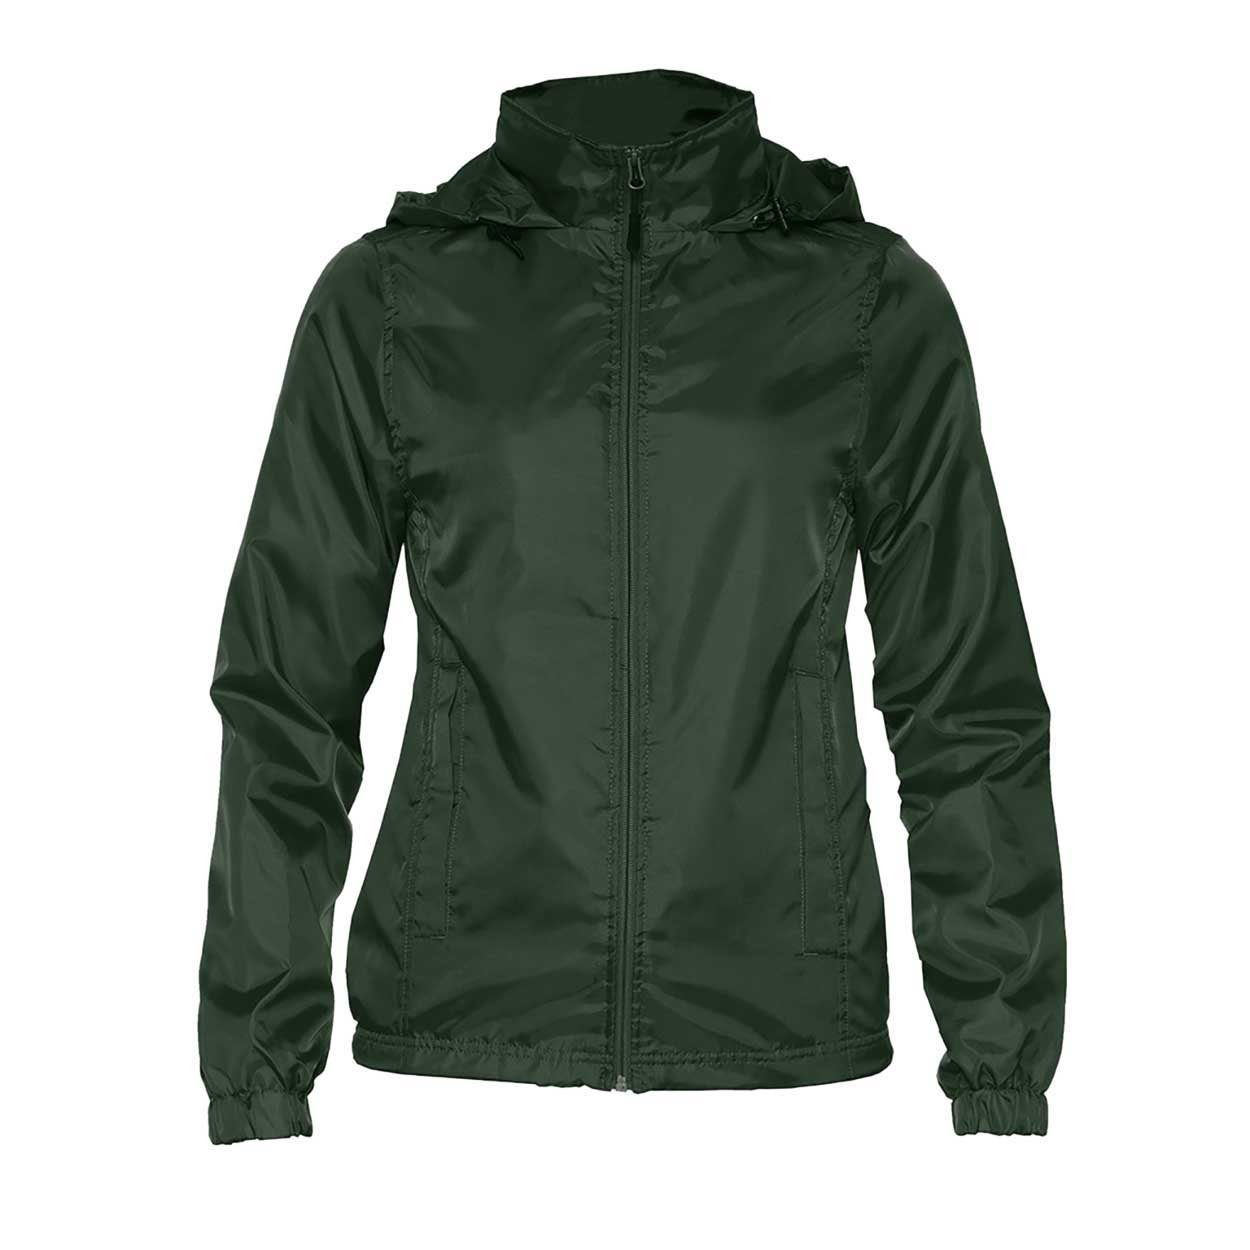 Gildan Womens/Ladies Hammer Windwear Jacket (XL) (Forest Green)